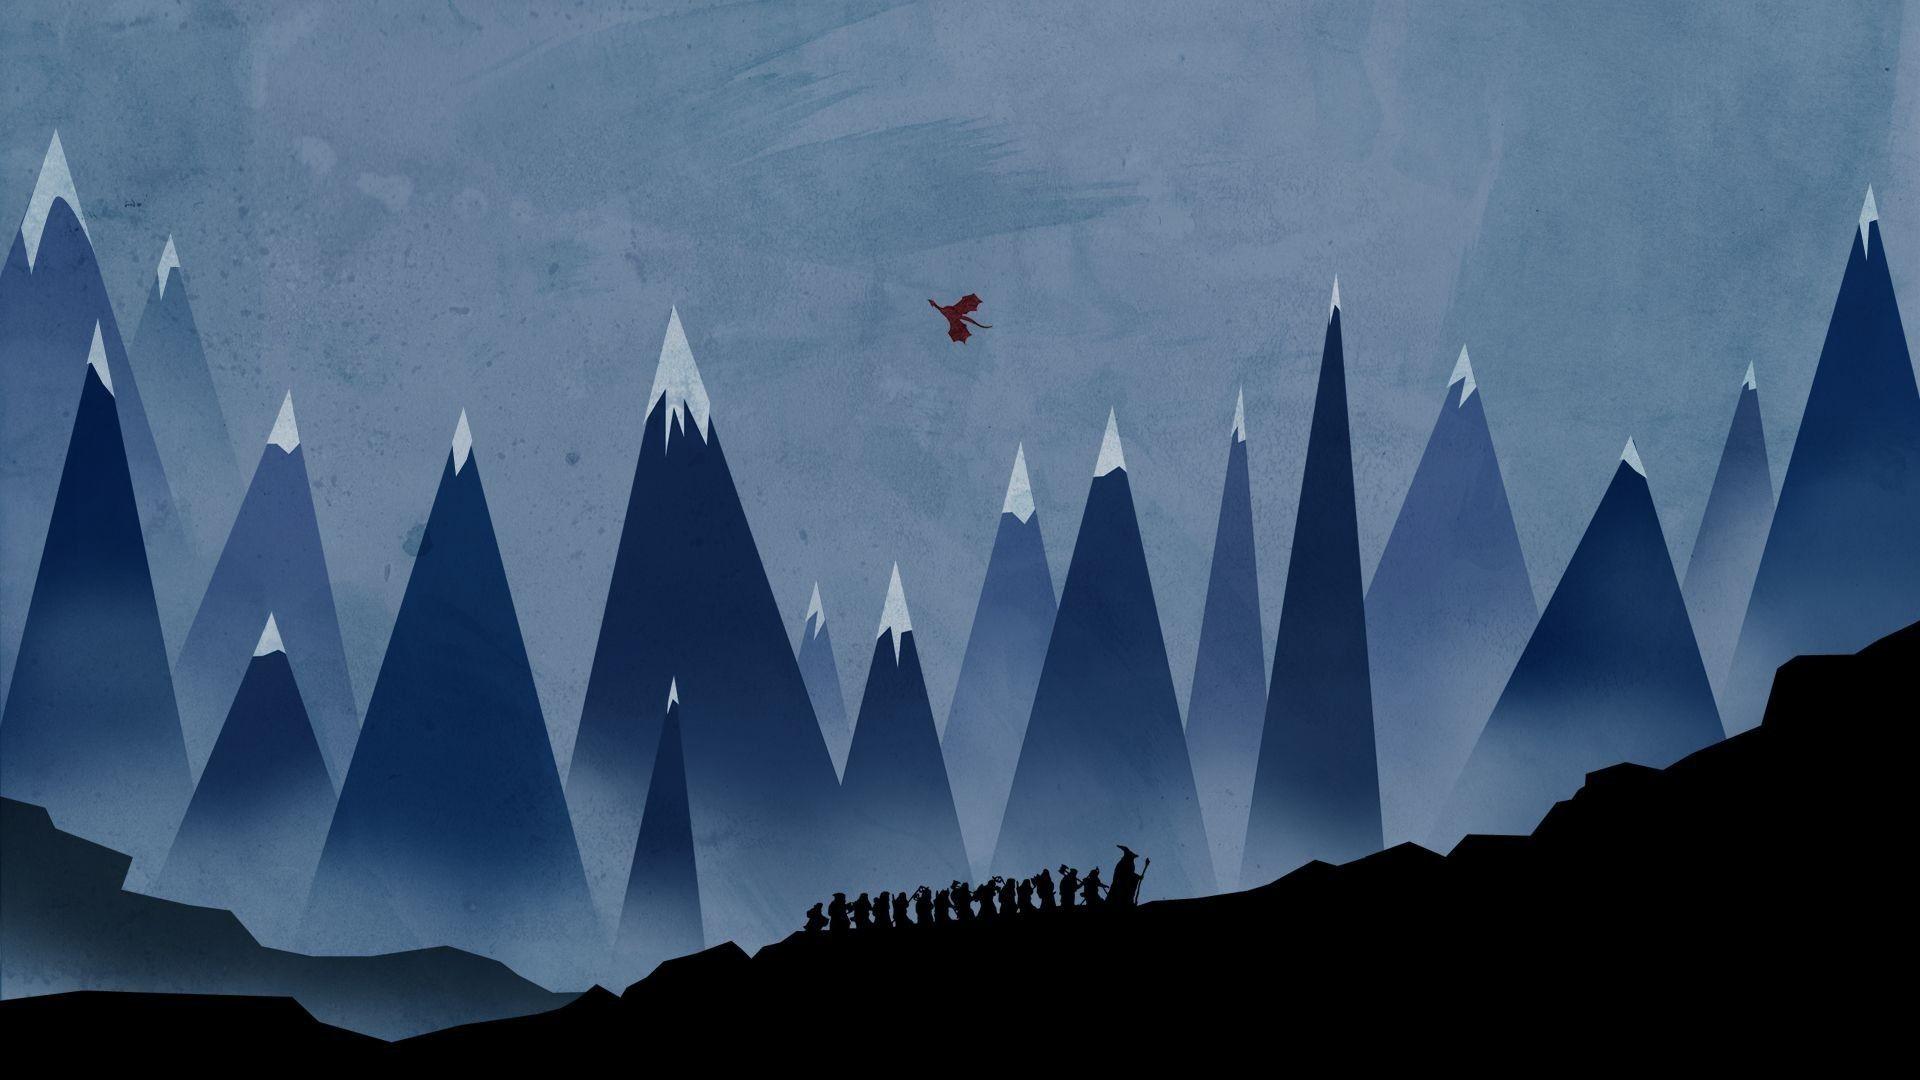 Movies The Hobbit The Hobbit: An Unexpected Journey wallpaper .